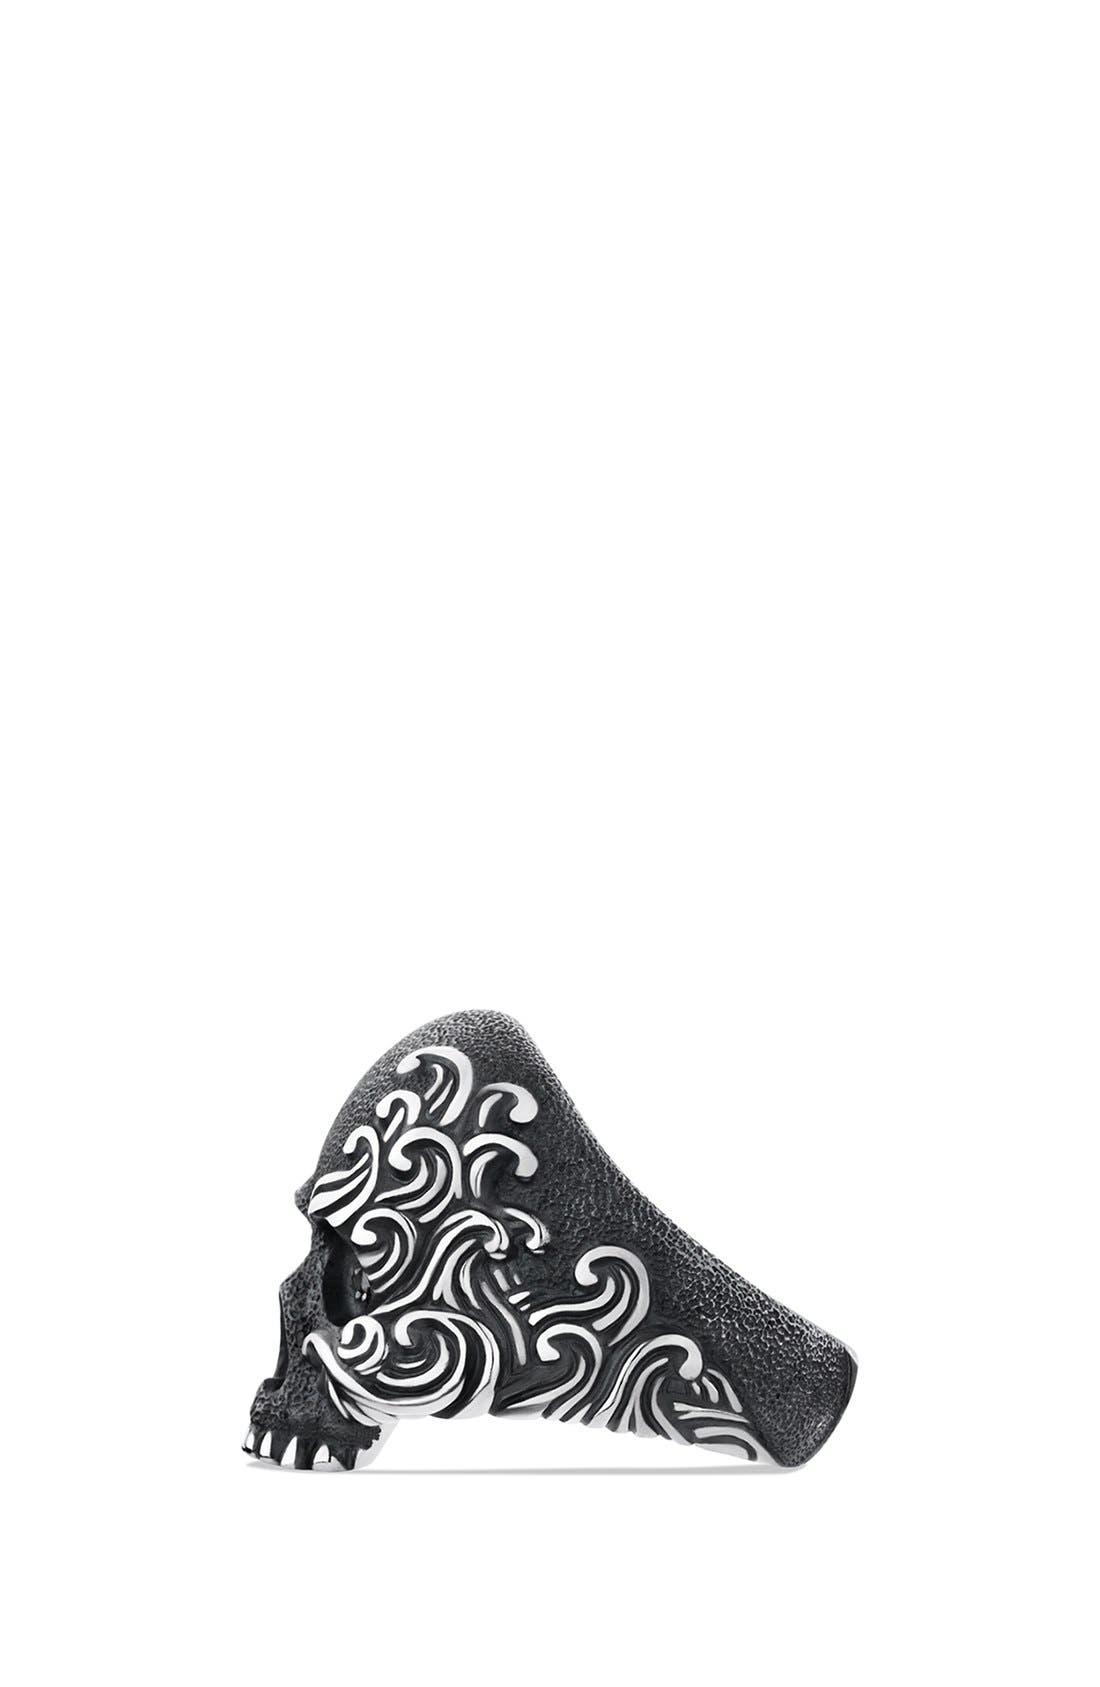 'Waves' Large Skull Ring with Black Diamonds,                             Alternate thumbnail 3, color,                             BLACK DIAMOND